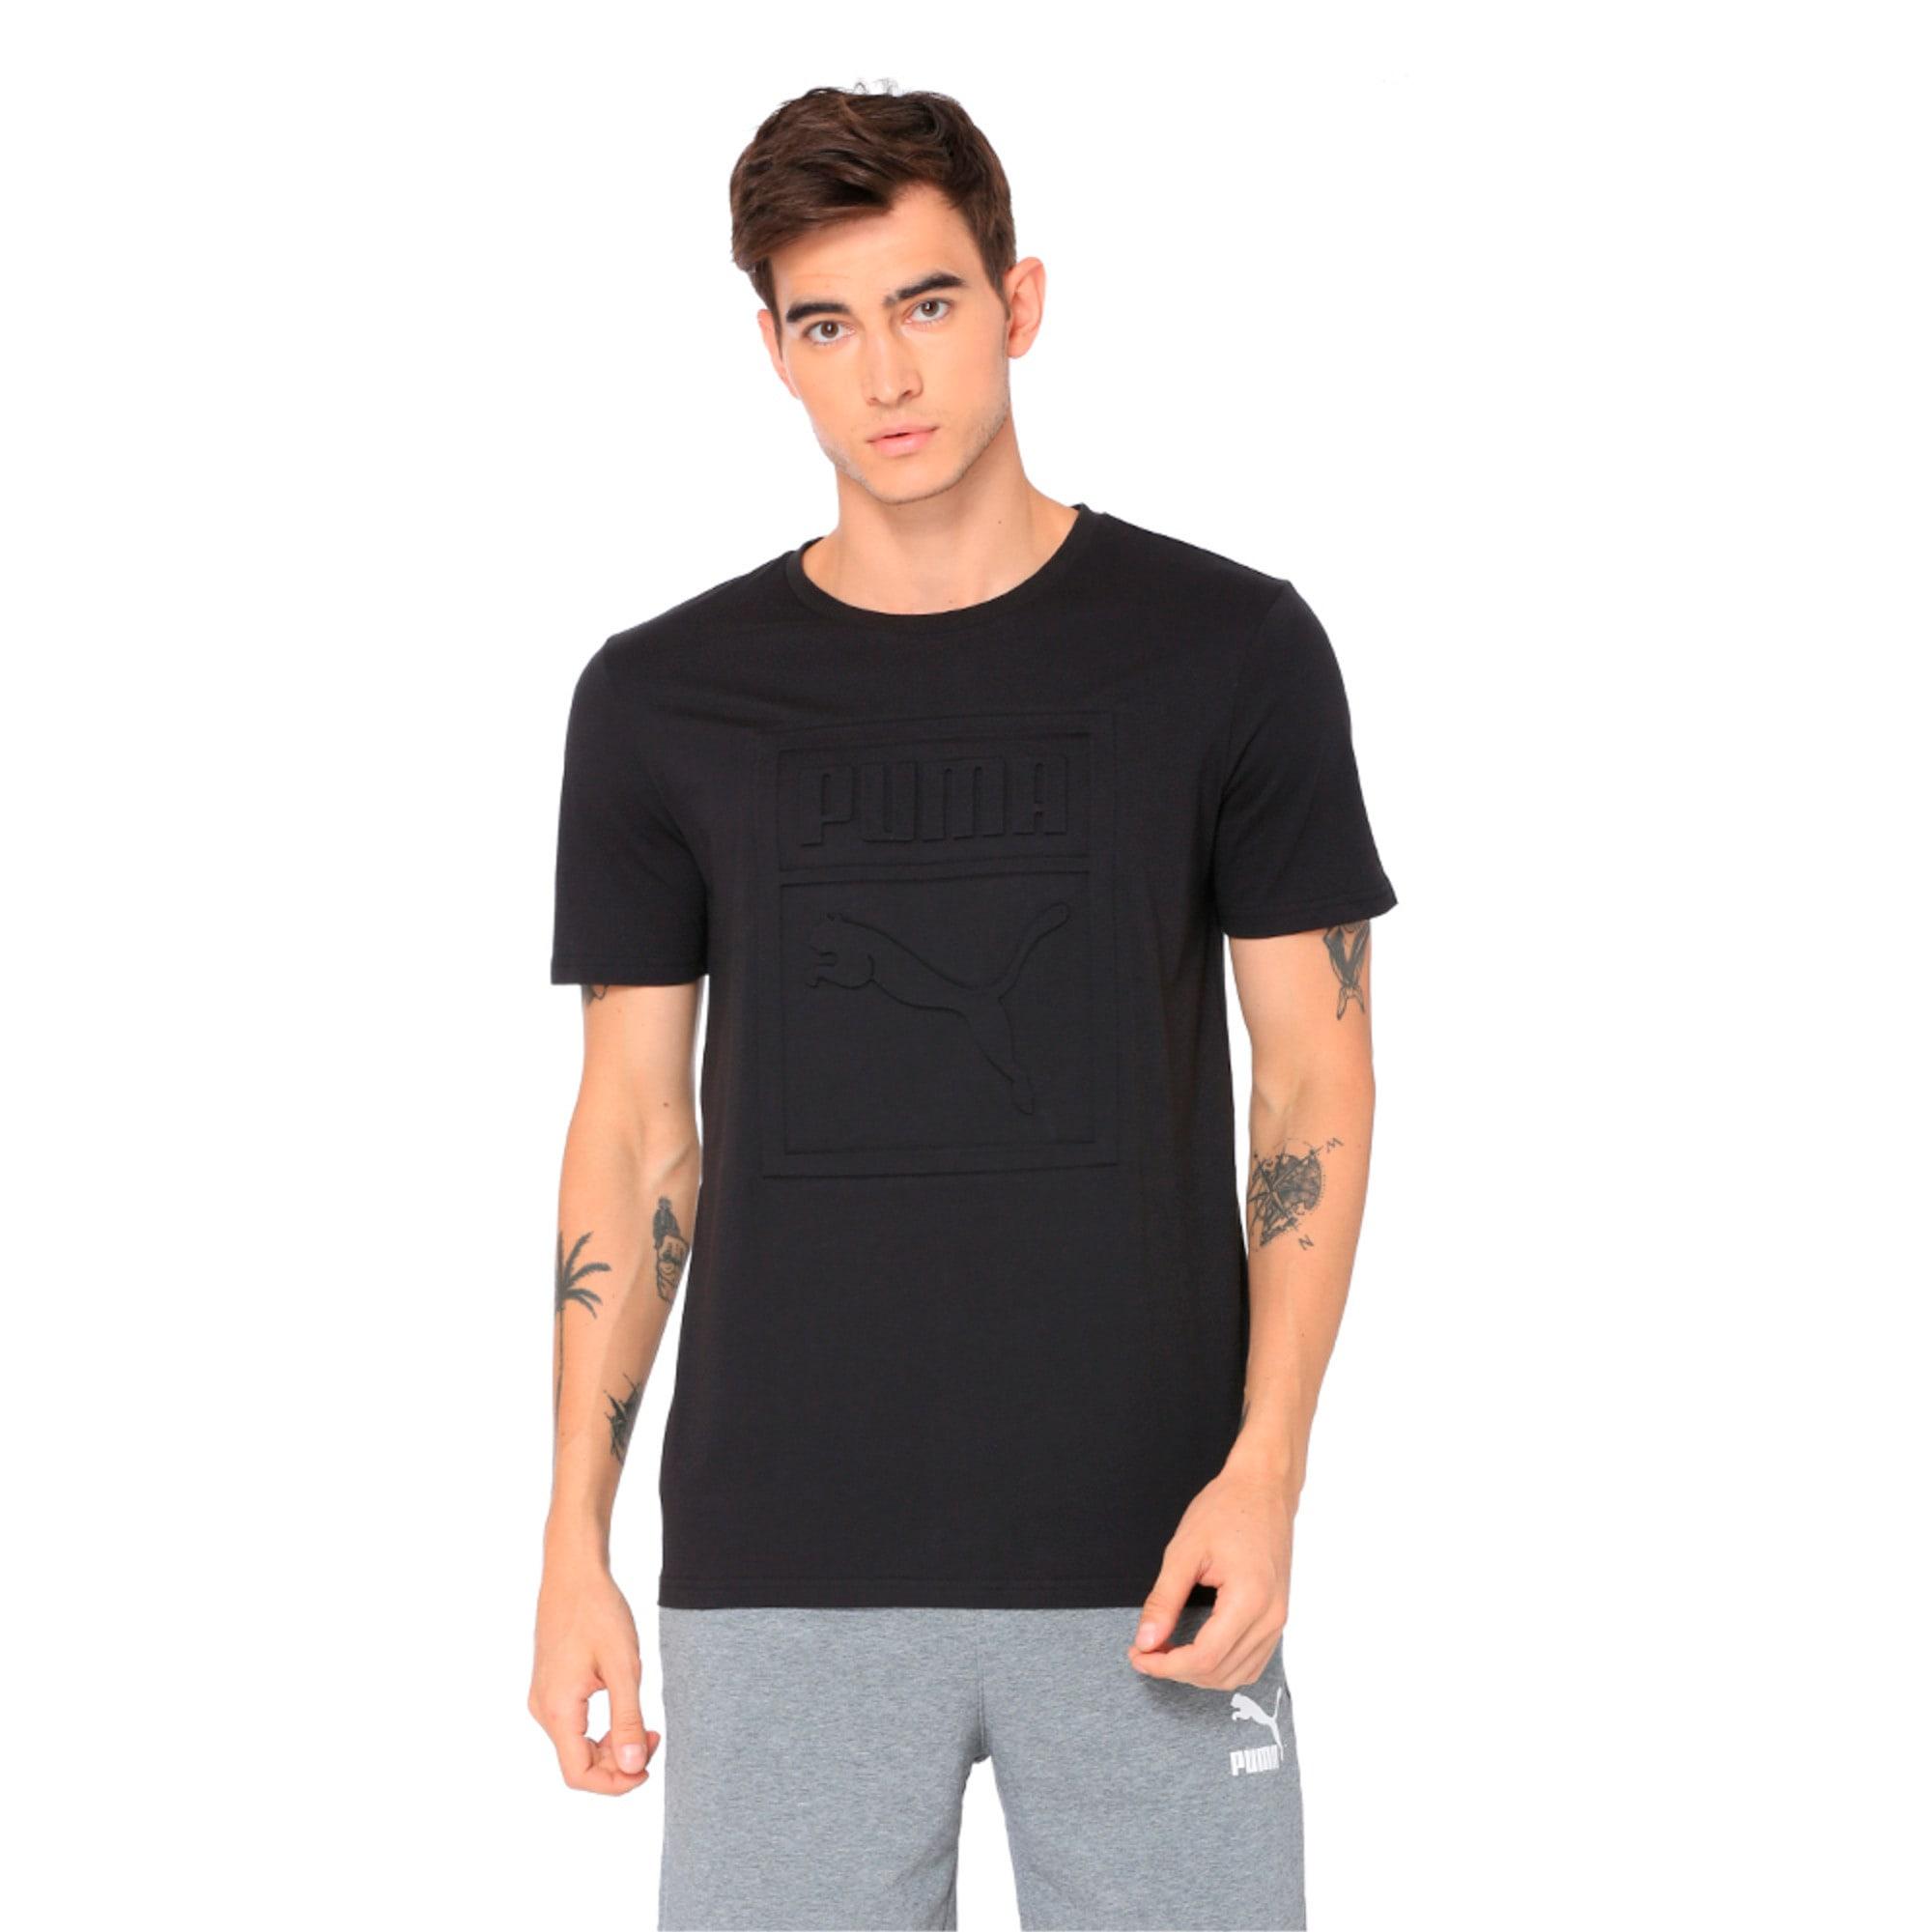 Thumbnail 4 of Classics Men's Archive Embossed Logo T-Shirt, Puma Black, medium-IND